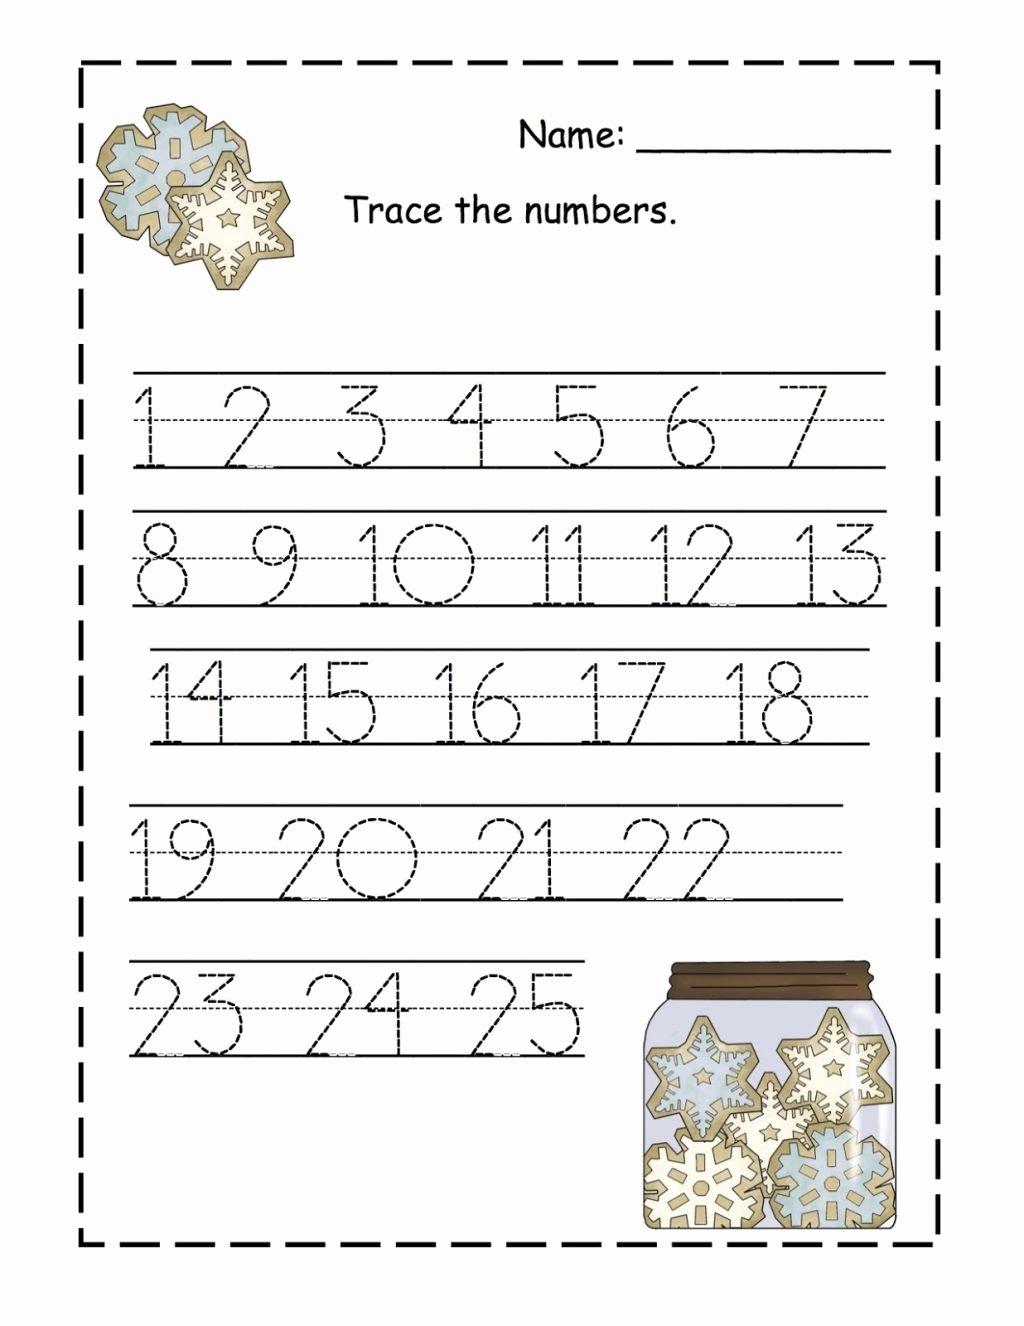 Printable Name Worksheets for Preschoolers Printable Worksheet Worksheet Free Tracing Worksheets astonishing